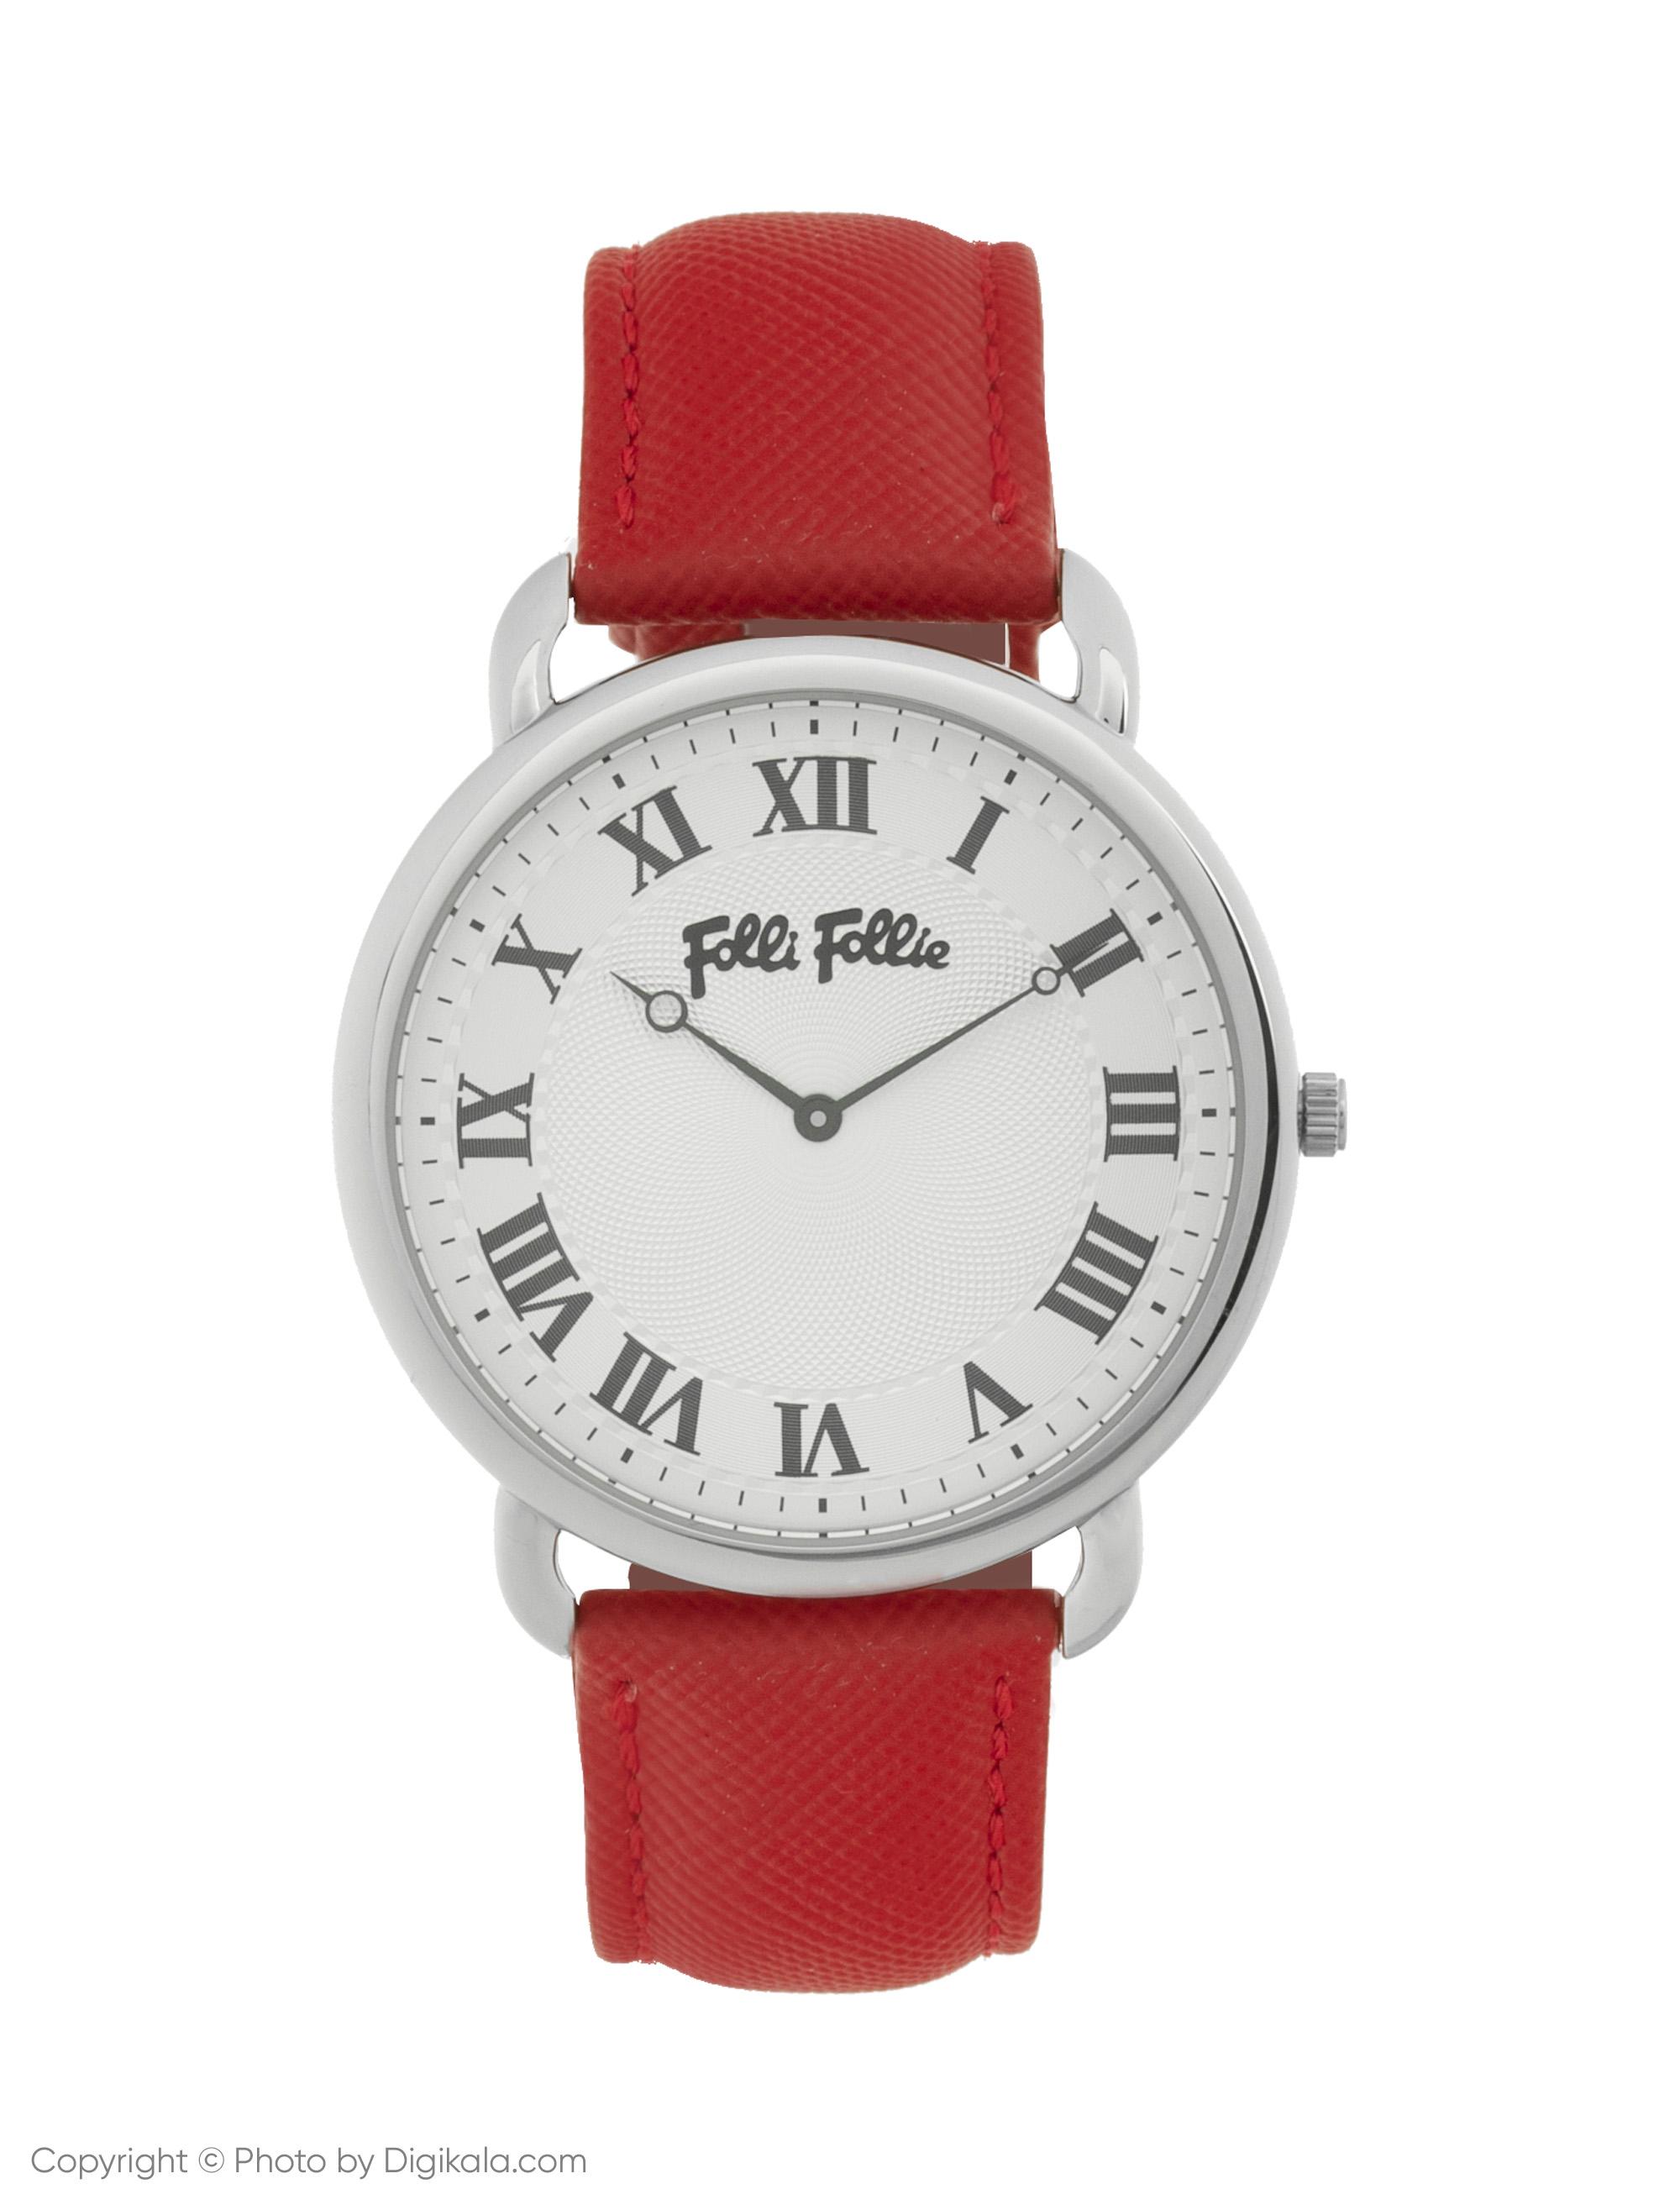 ساعت مچی  زنانه فولی فولیه مدل WF16T014SPS-RE (بدون جعبه اورجینال)              اصل